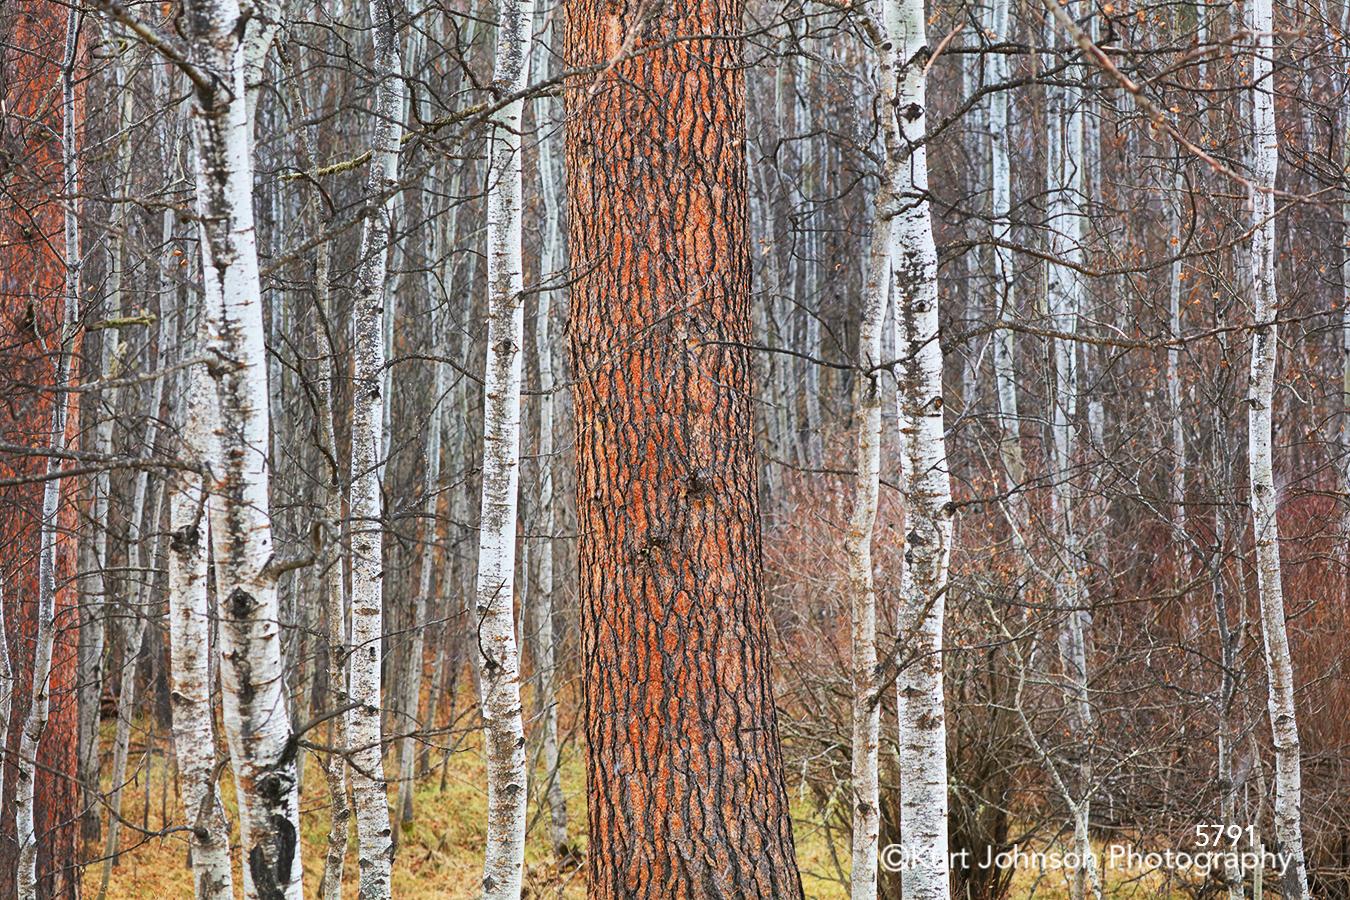 White red brown birch trees forest Dakotas South Dakota Black Hills